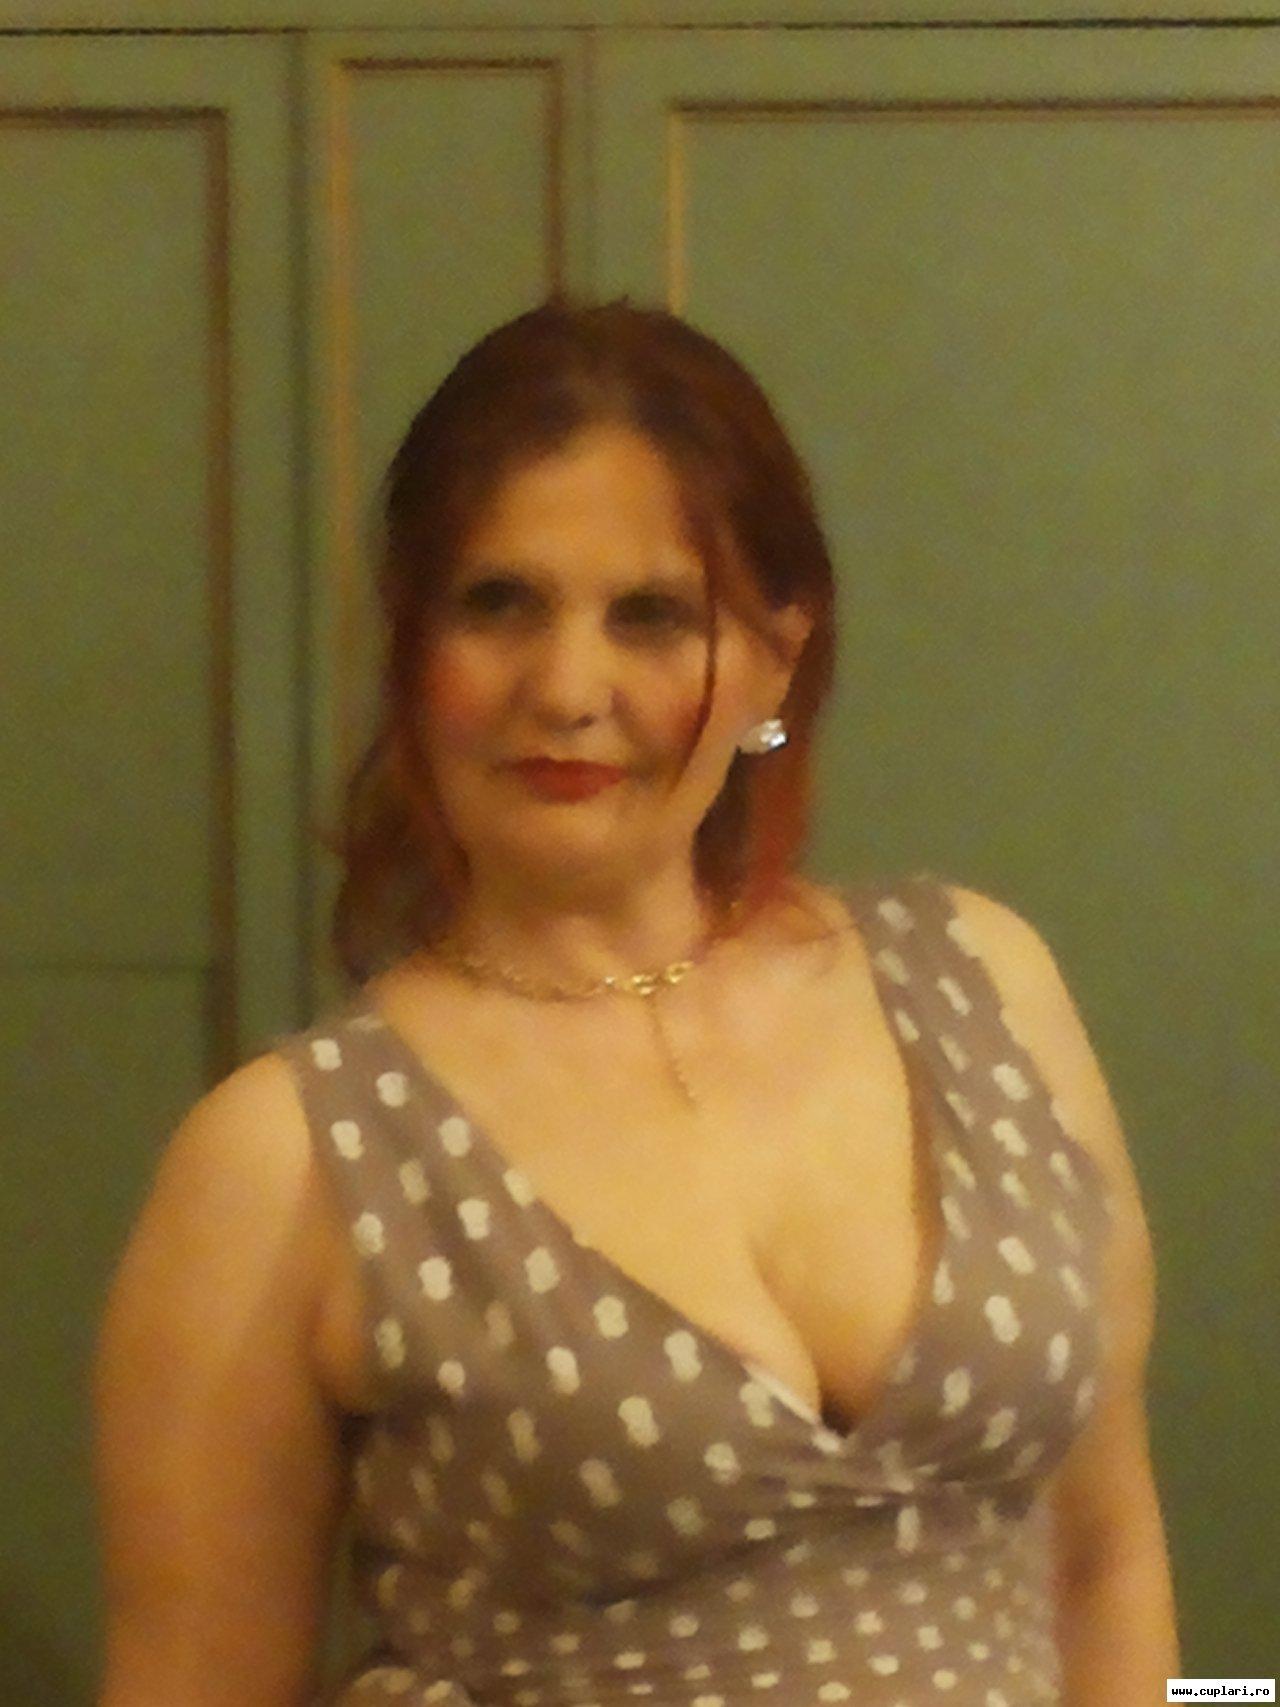 Femei frumoase din reghin. Matrimoniale Mures - Publiro